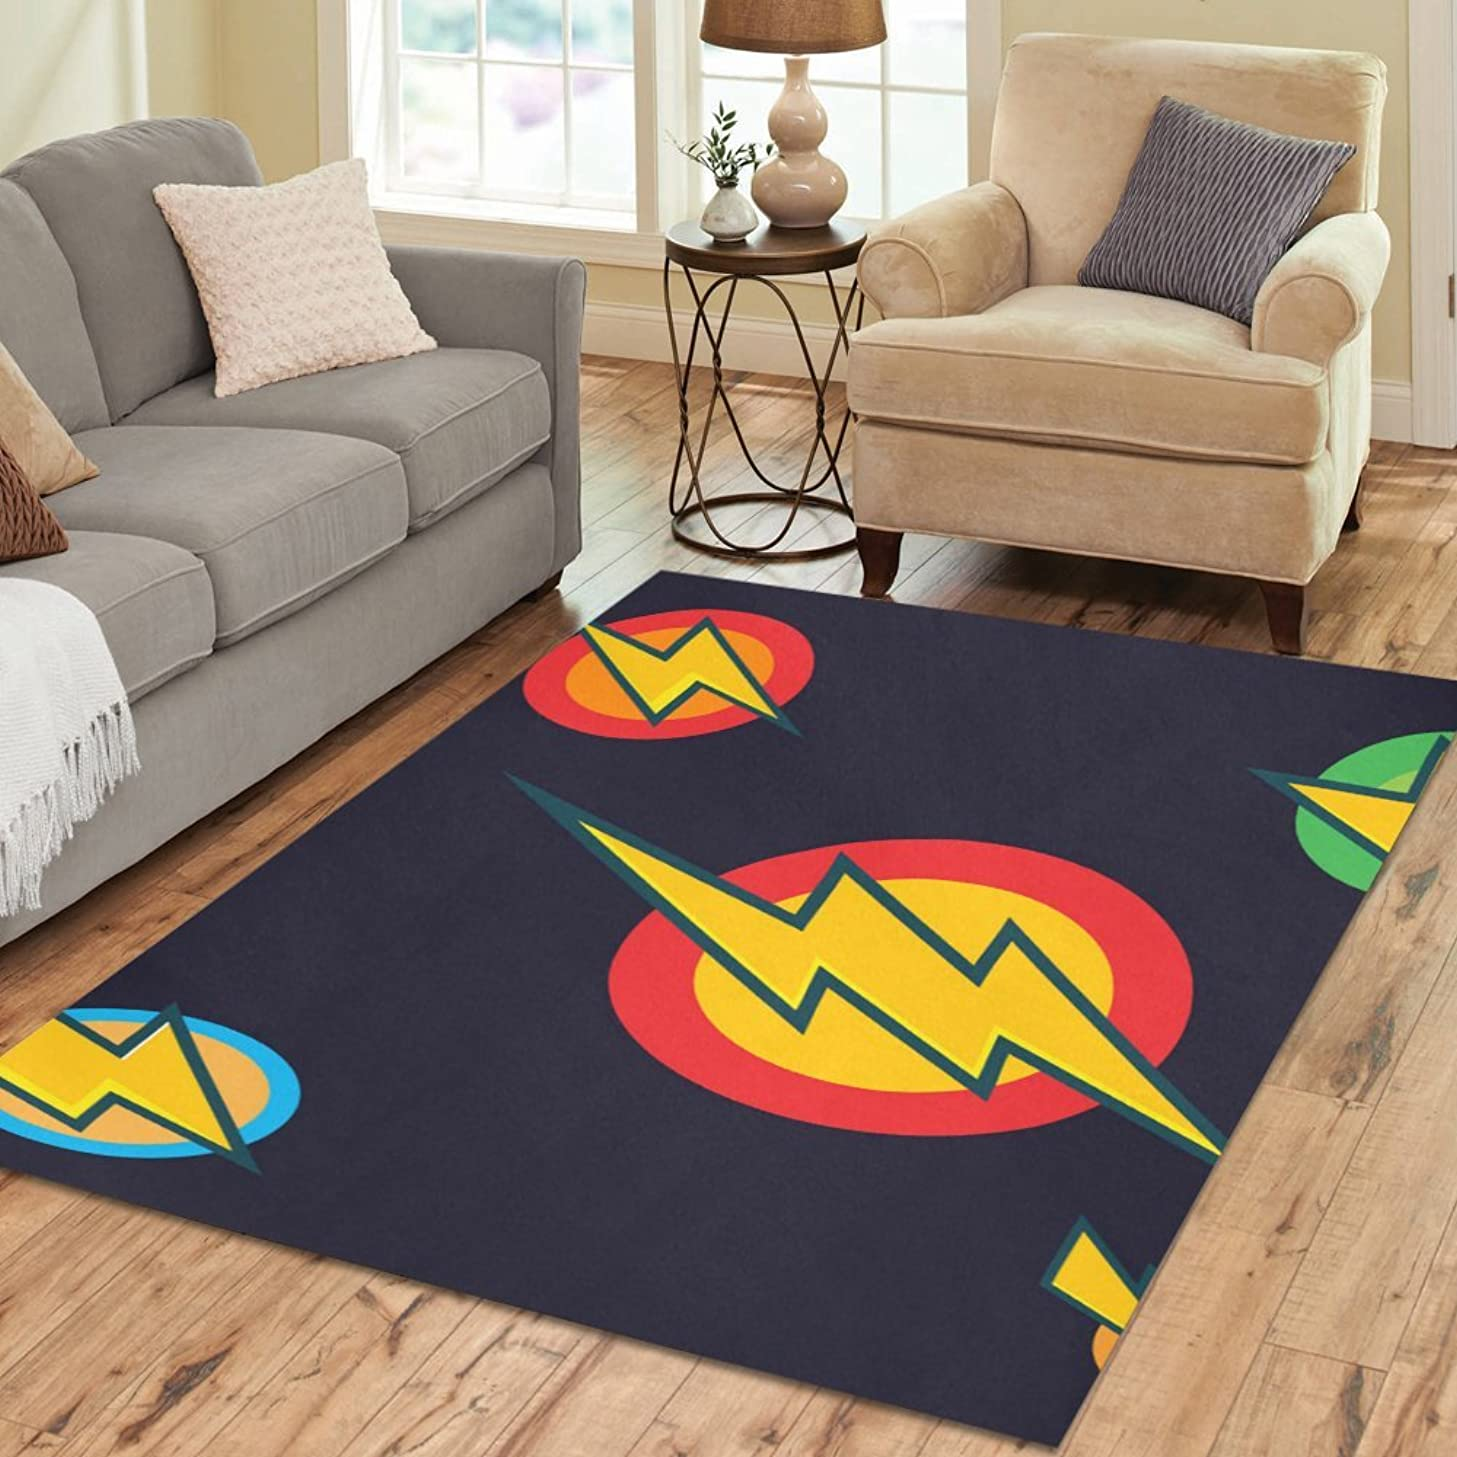 InterestPrint Floor Rugs Mat Custom Flash Area Rugs Modern Carpet for Home Dining Room Living Room Decoration Size 7'x5'